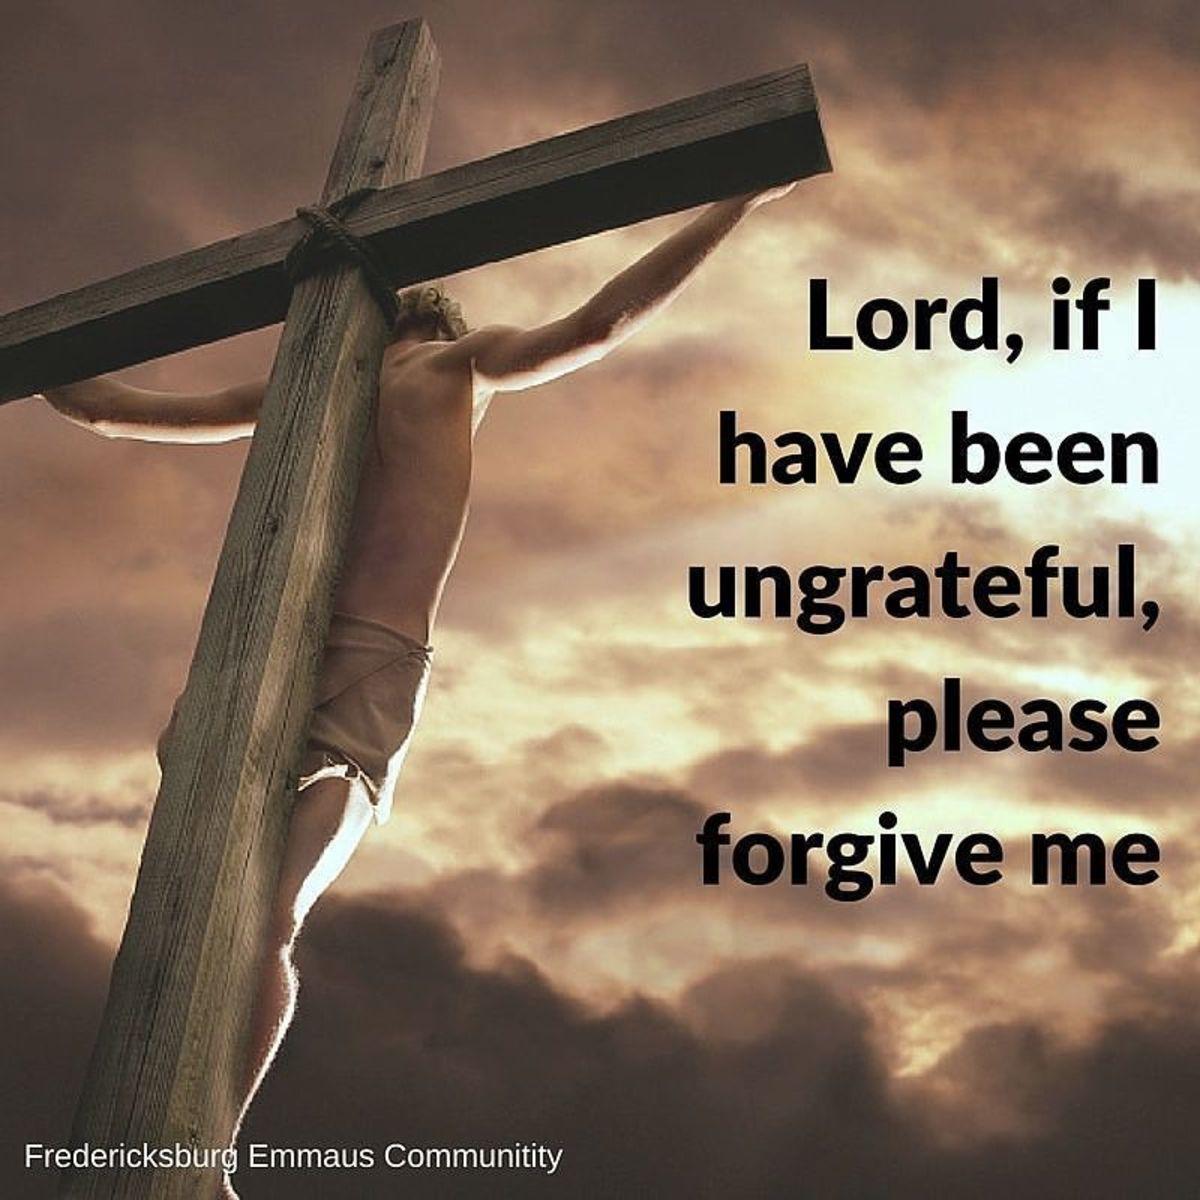 will-god-forgive-us-of-repetative-sins